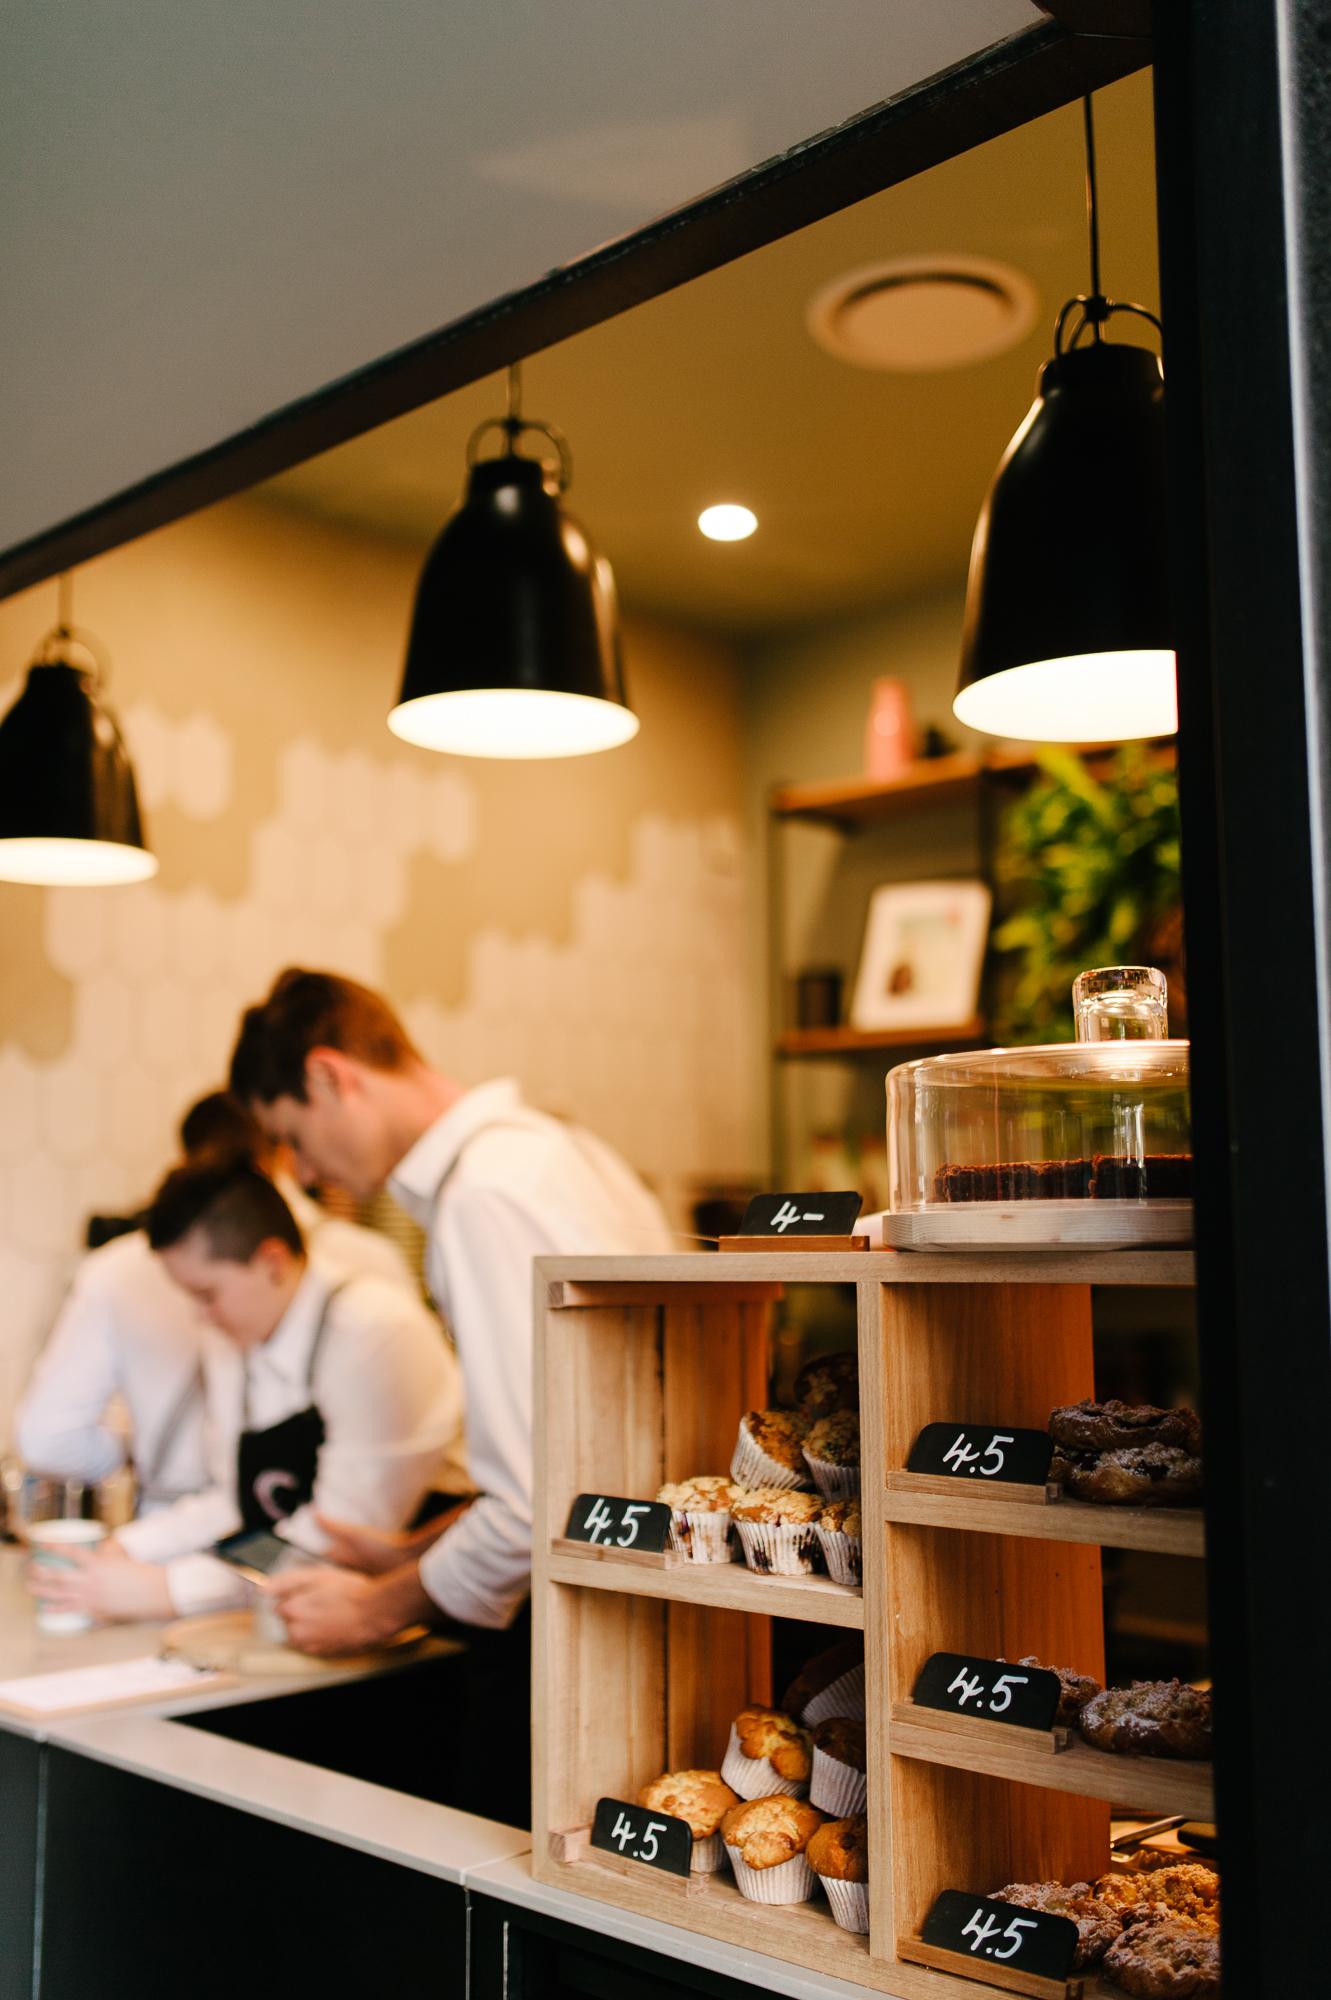 The Coop Espresso Bar